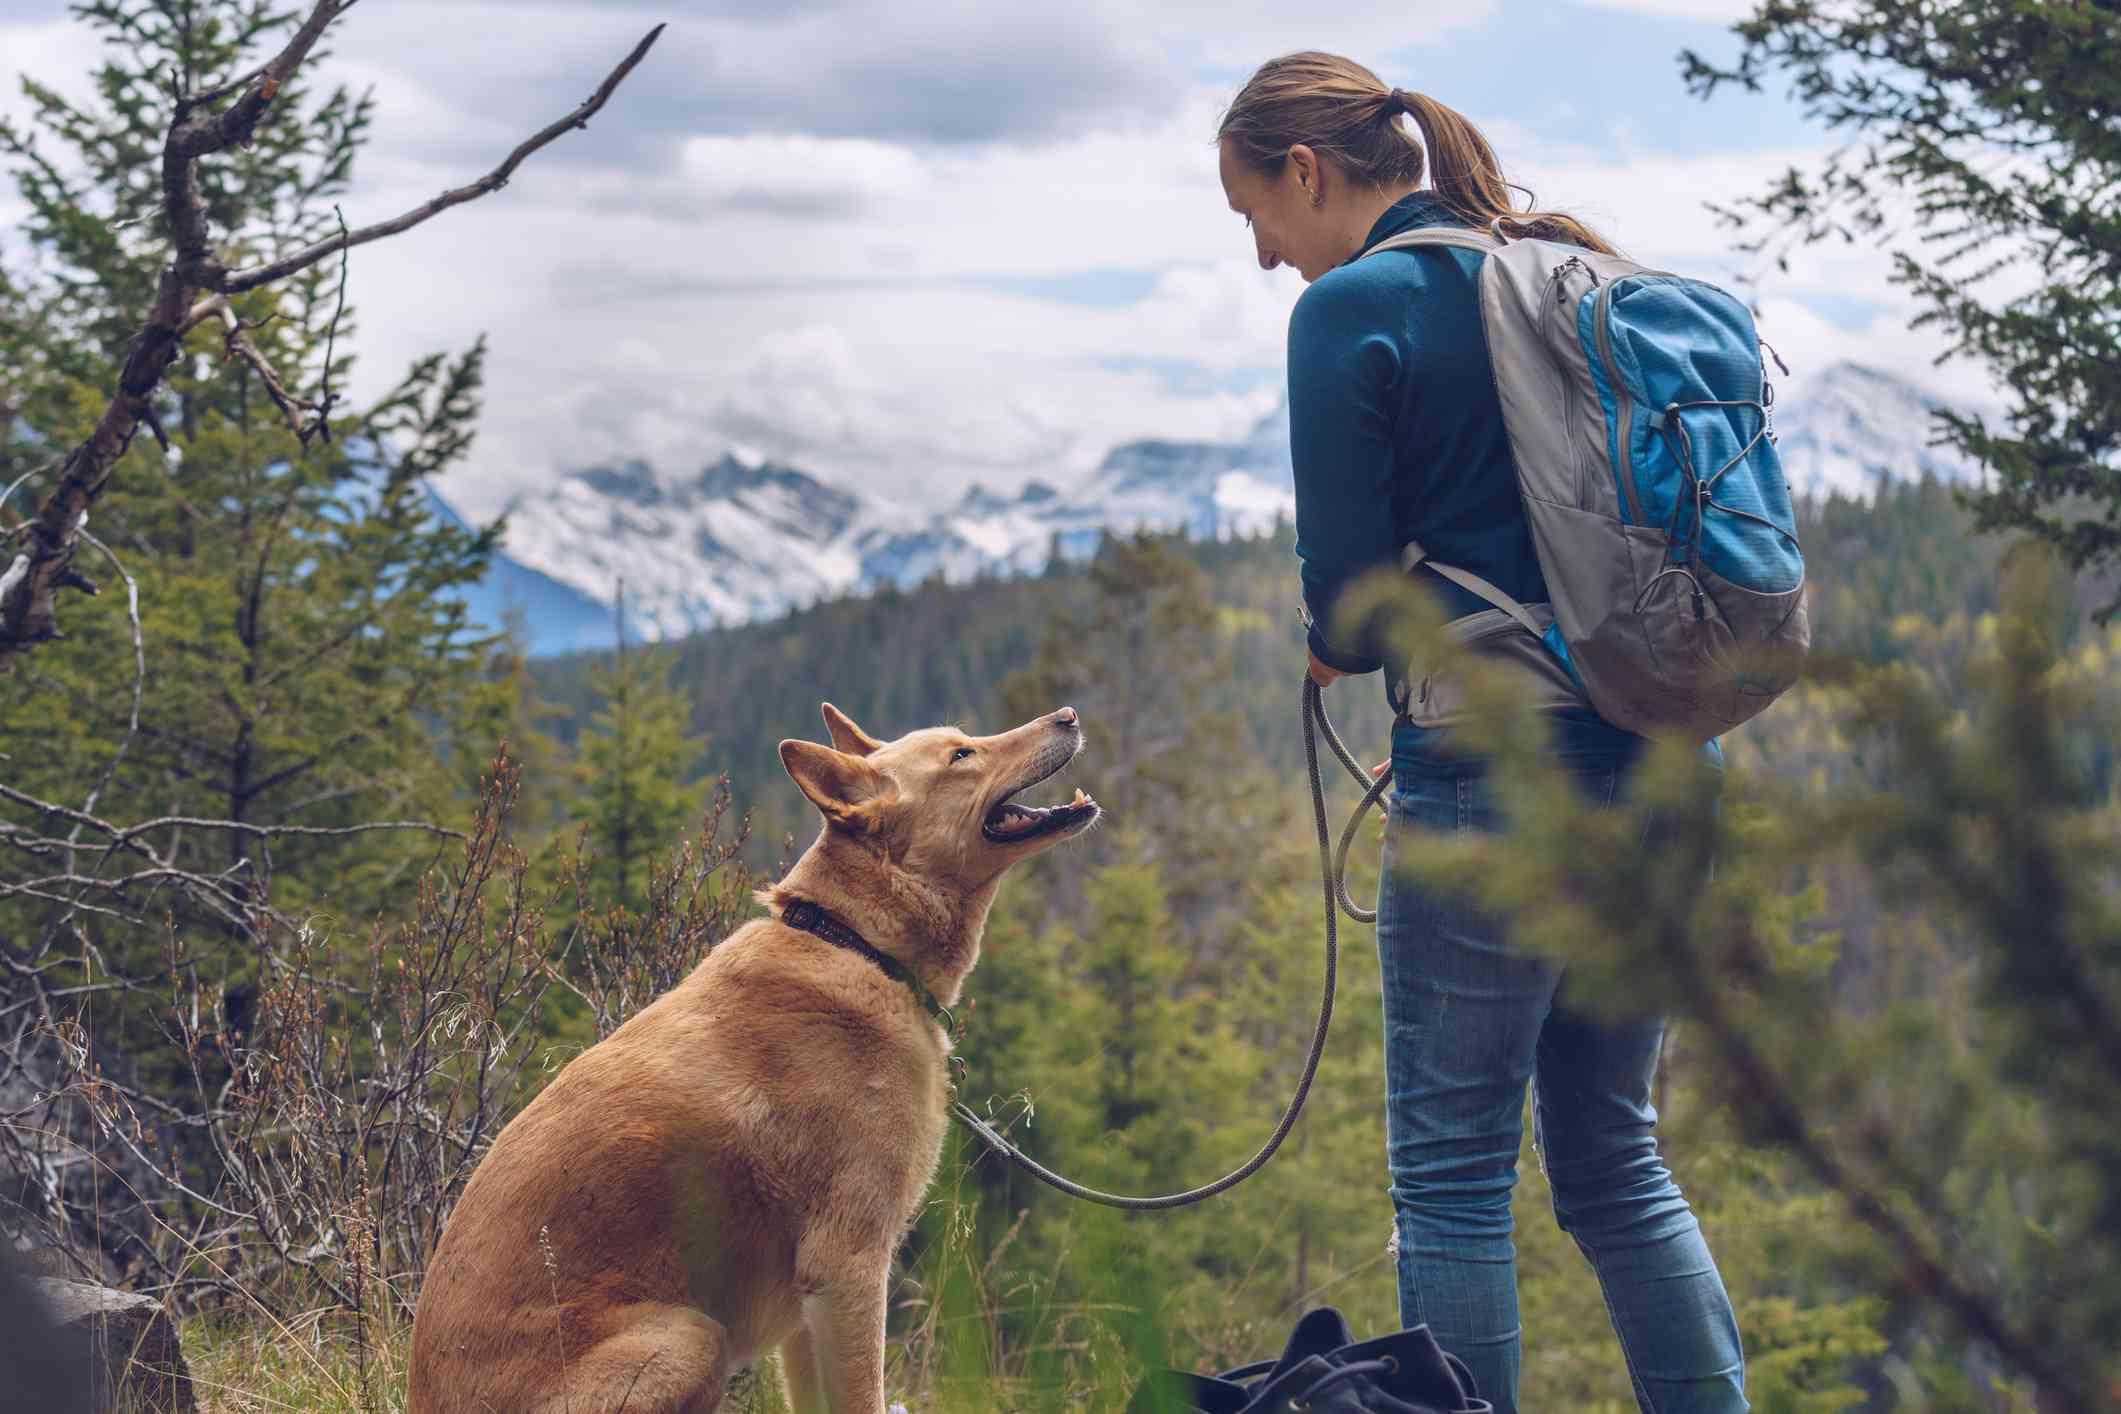 Keeping a dog on leash while hiking